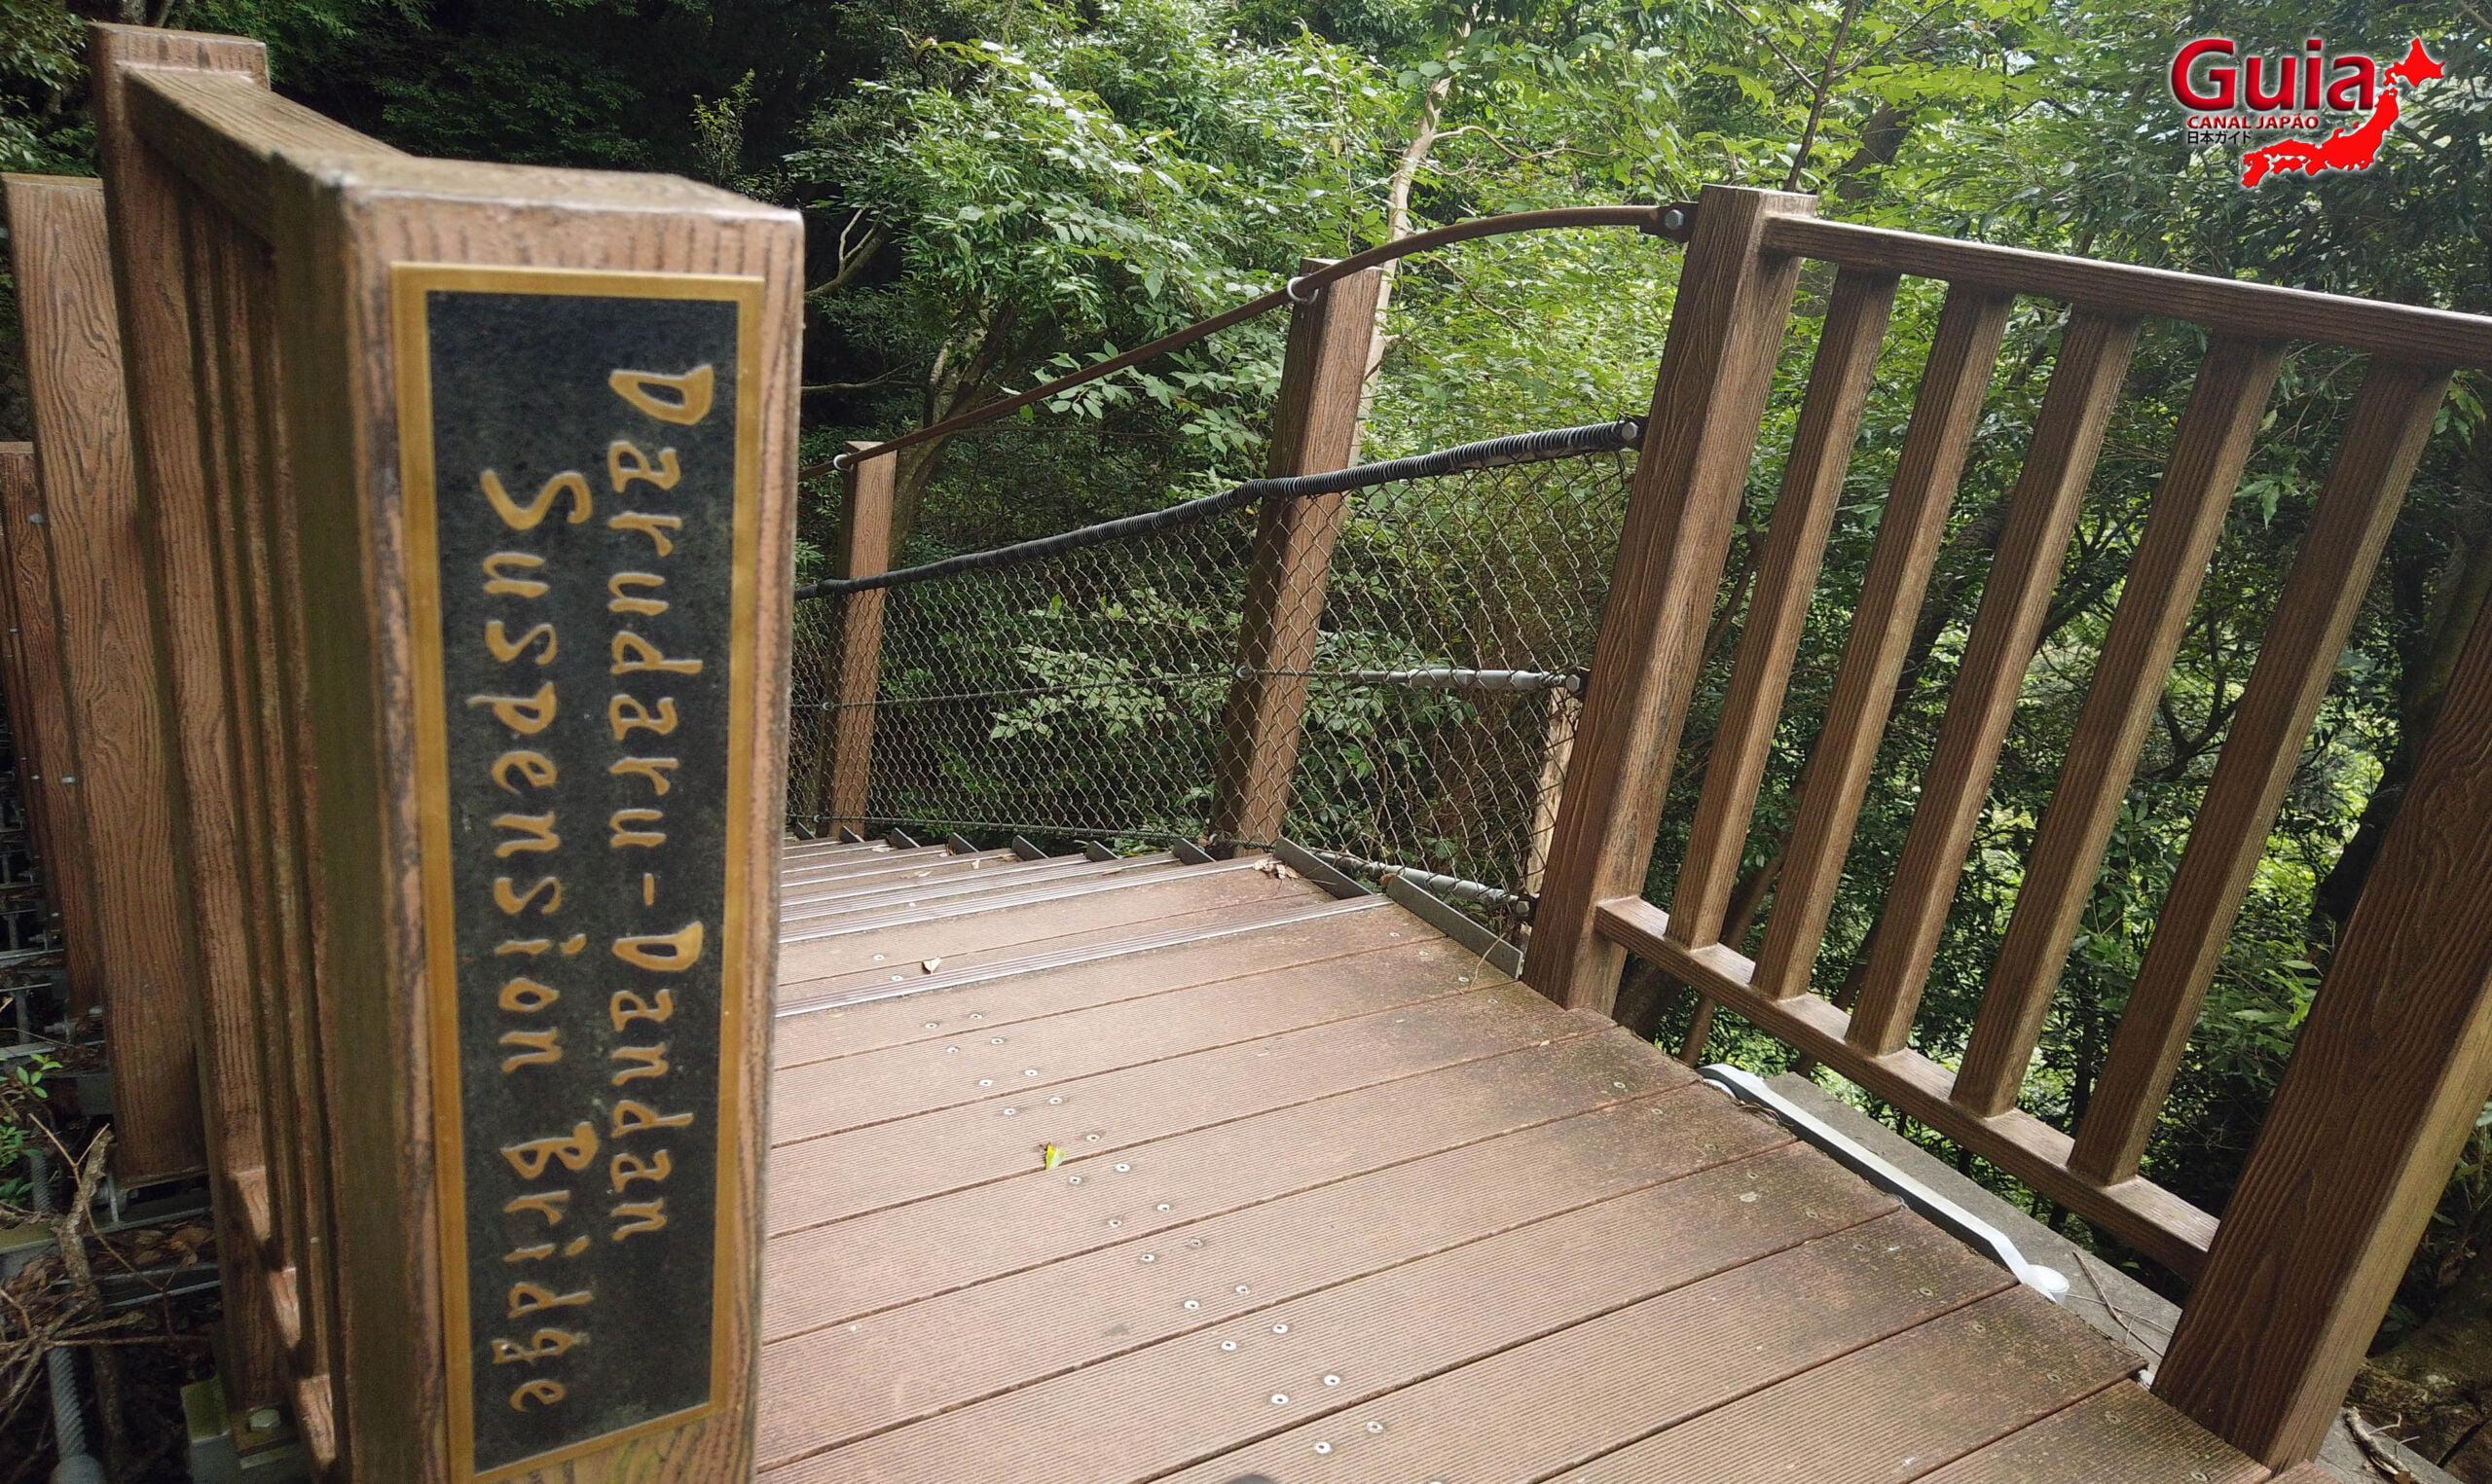 7 Cachoeira de Kawazu Nanadaru - 河津 七 滝 7